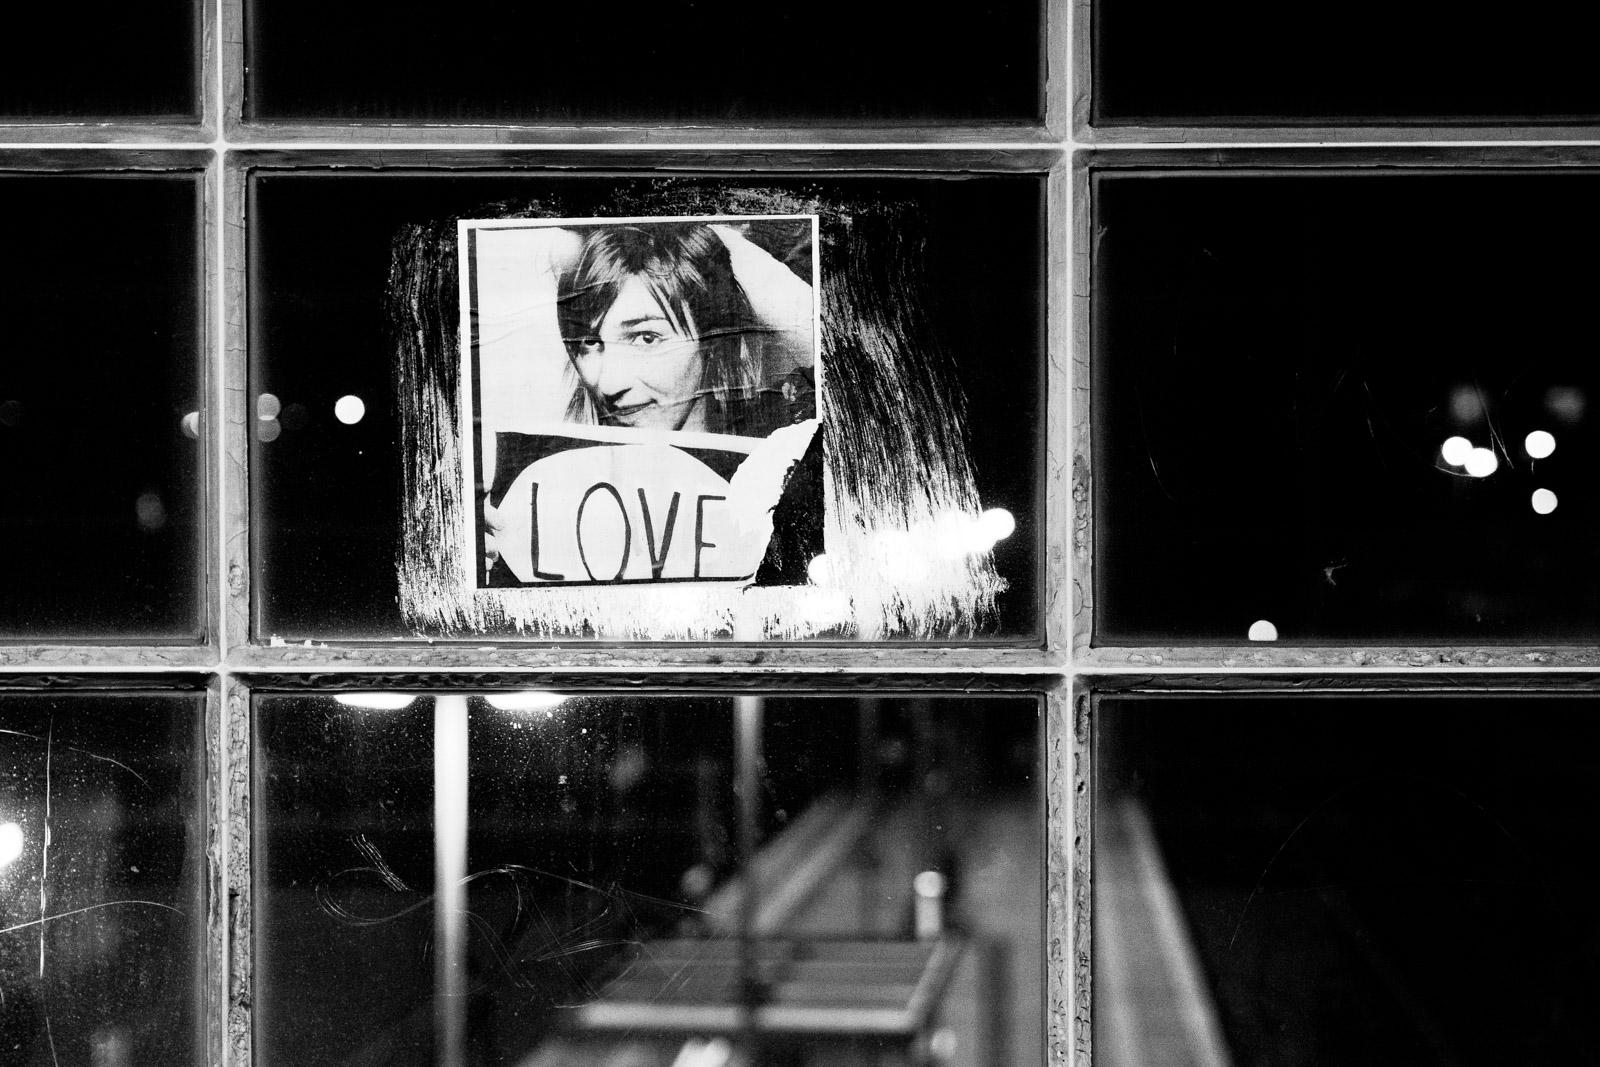 i've found love in a window